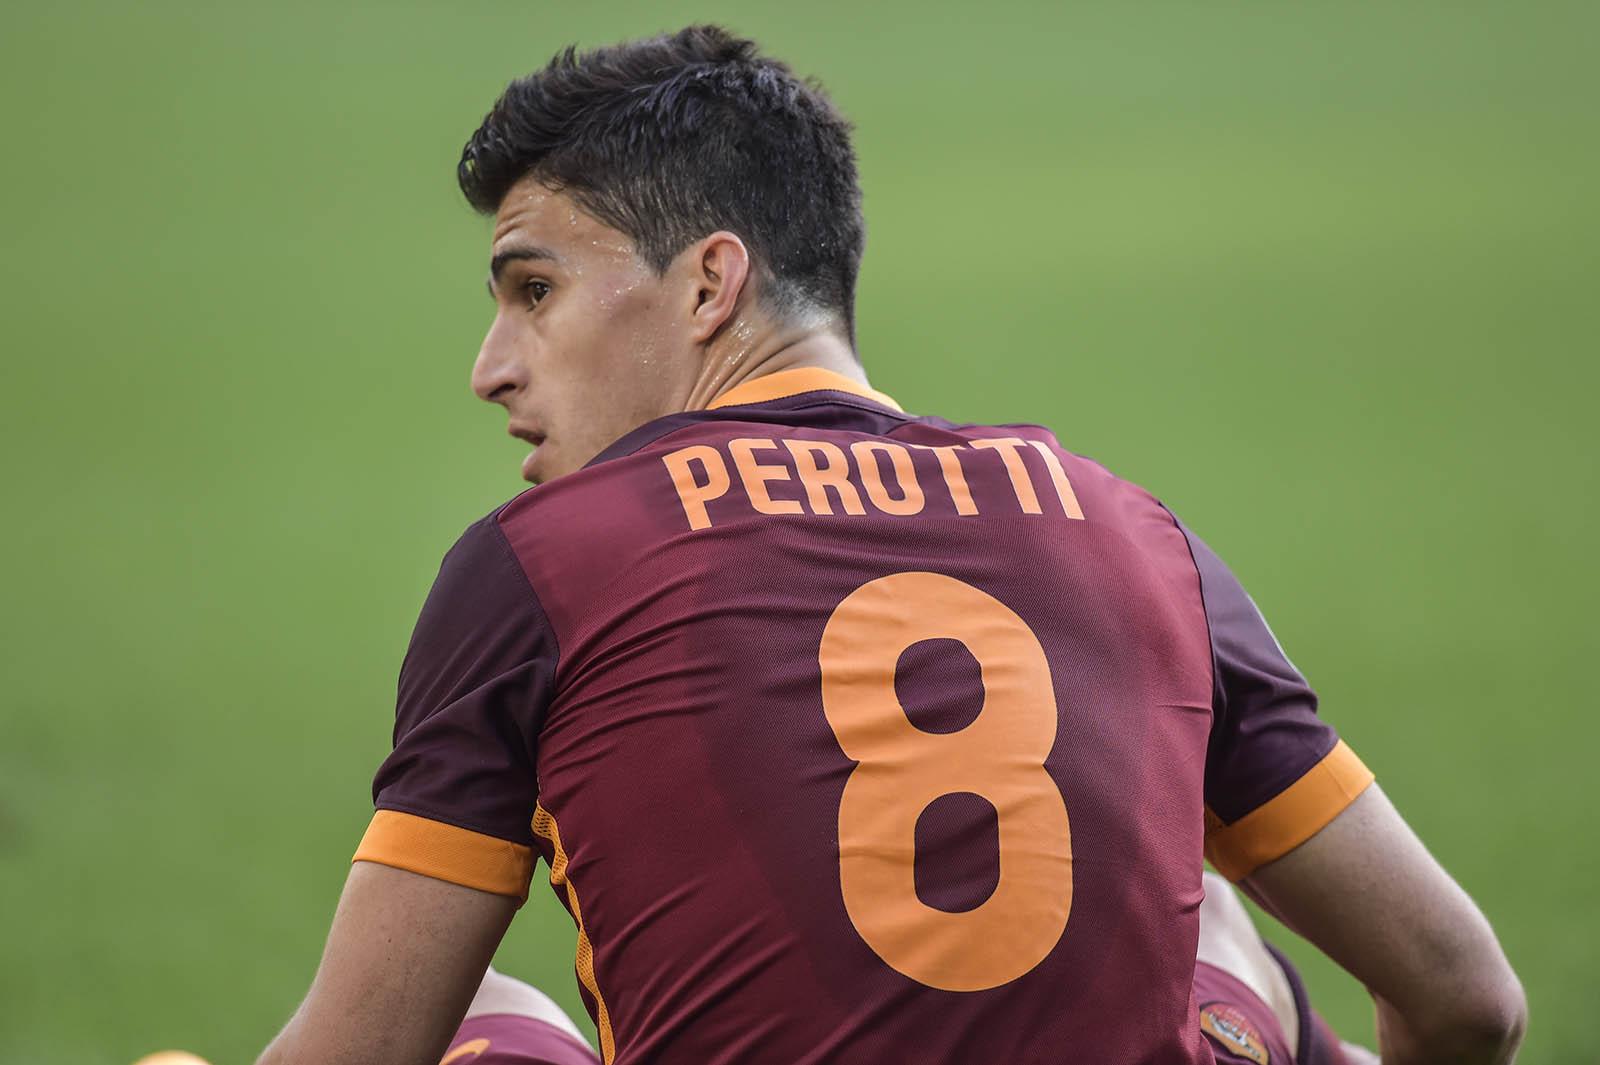 perotti-udinese-roma-1